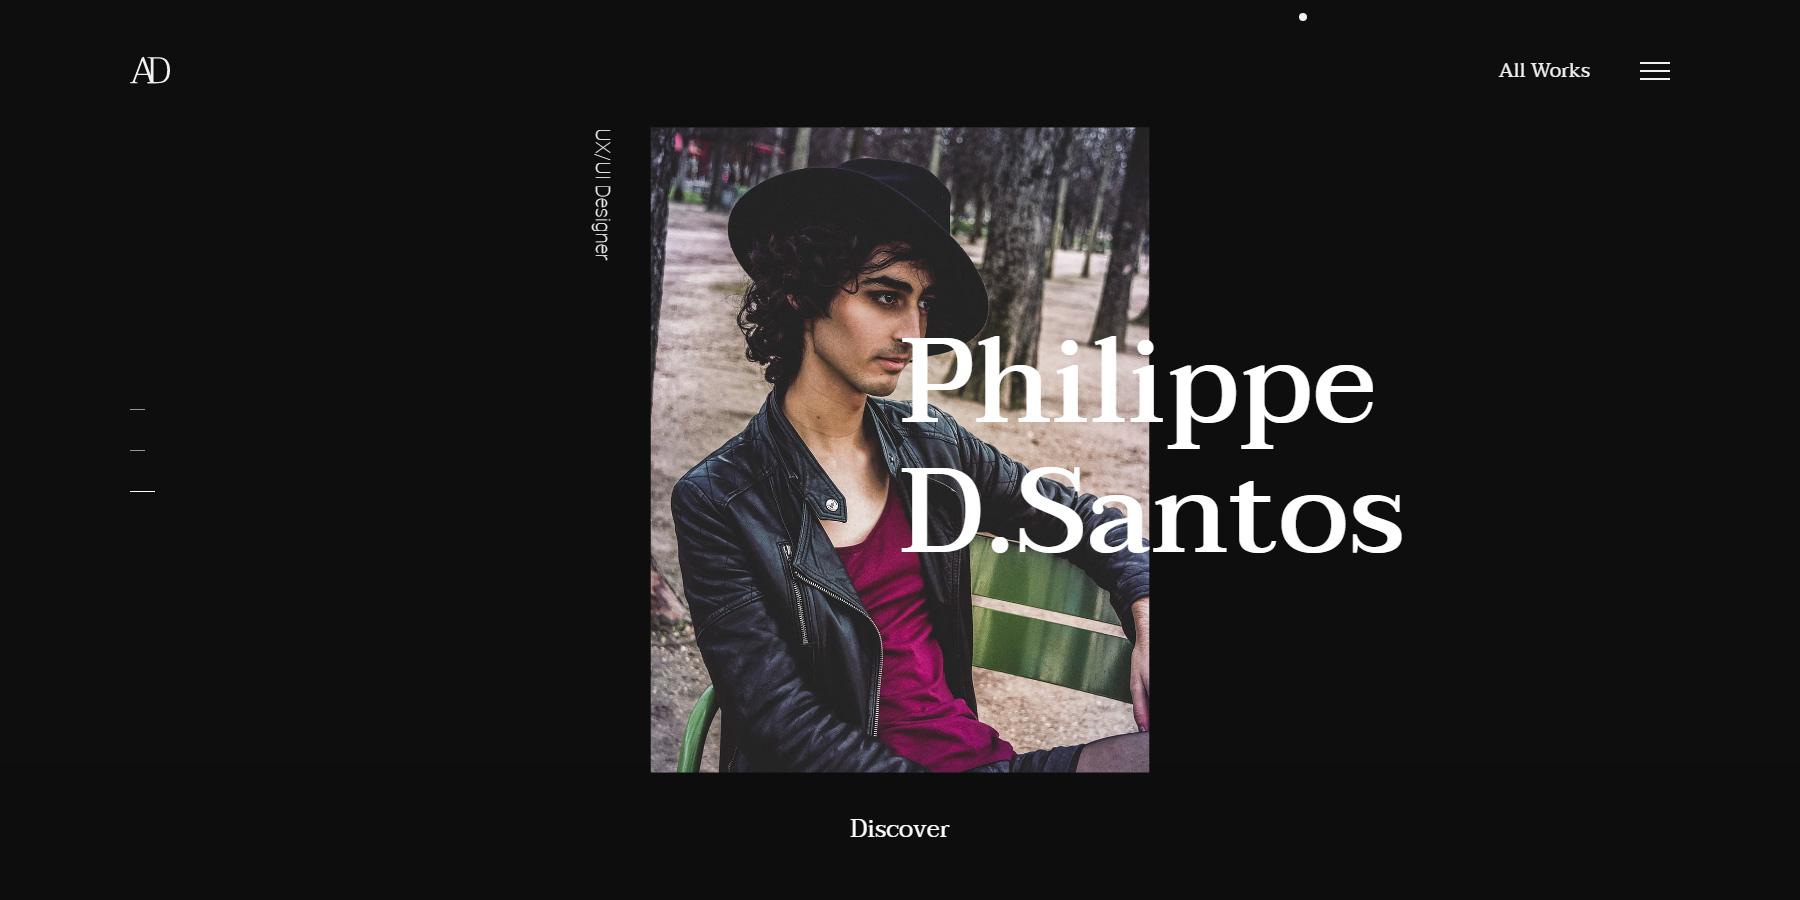 Alban Delachaume - Portfolio - Website of the Day